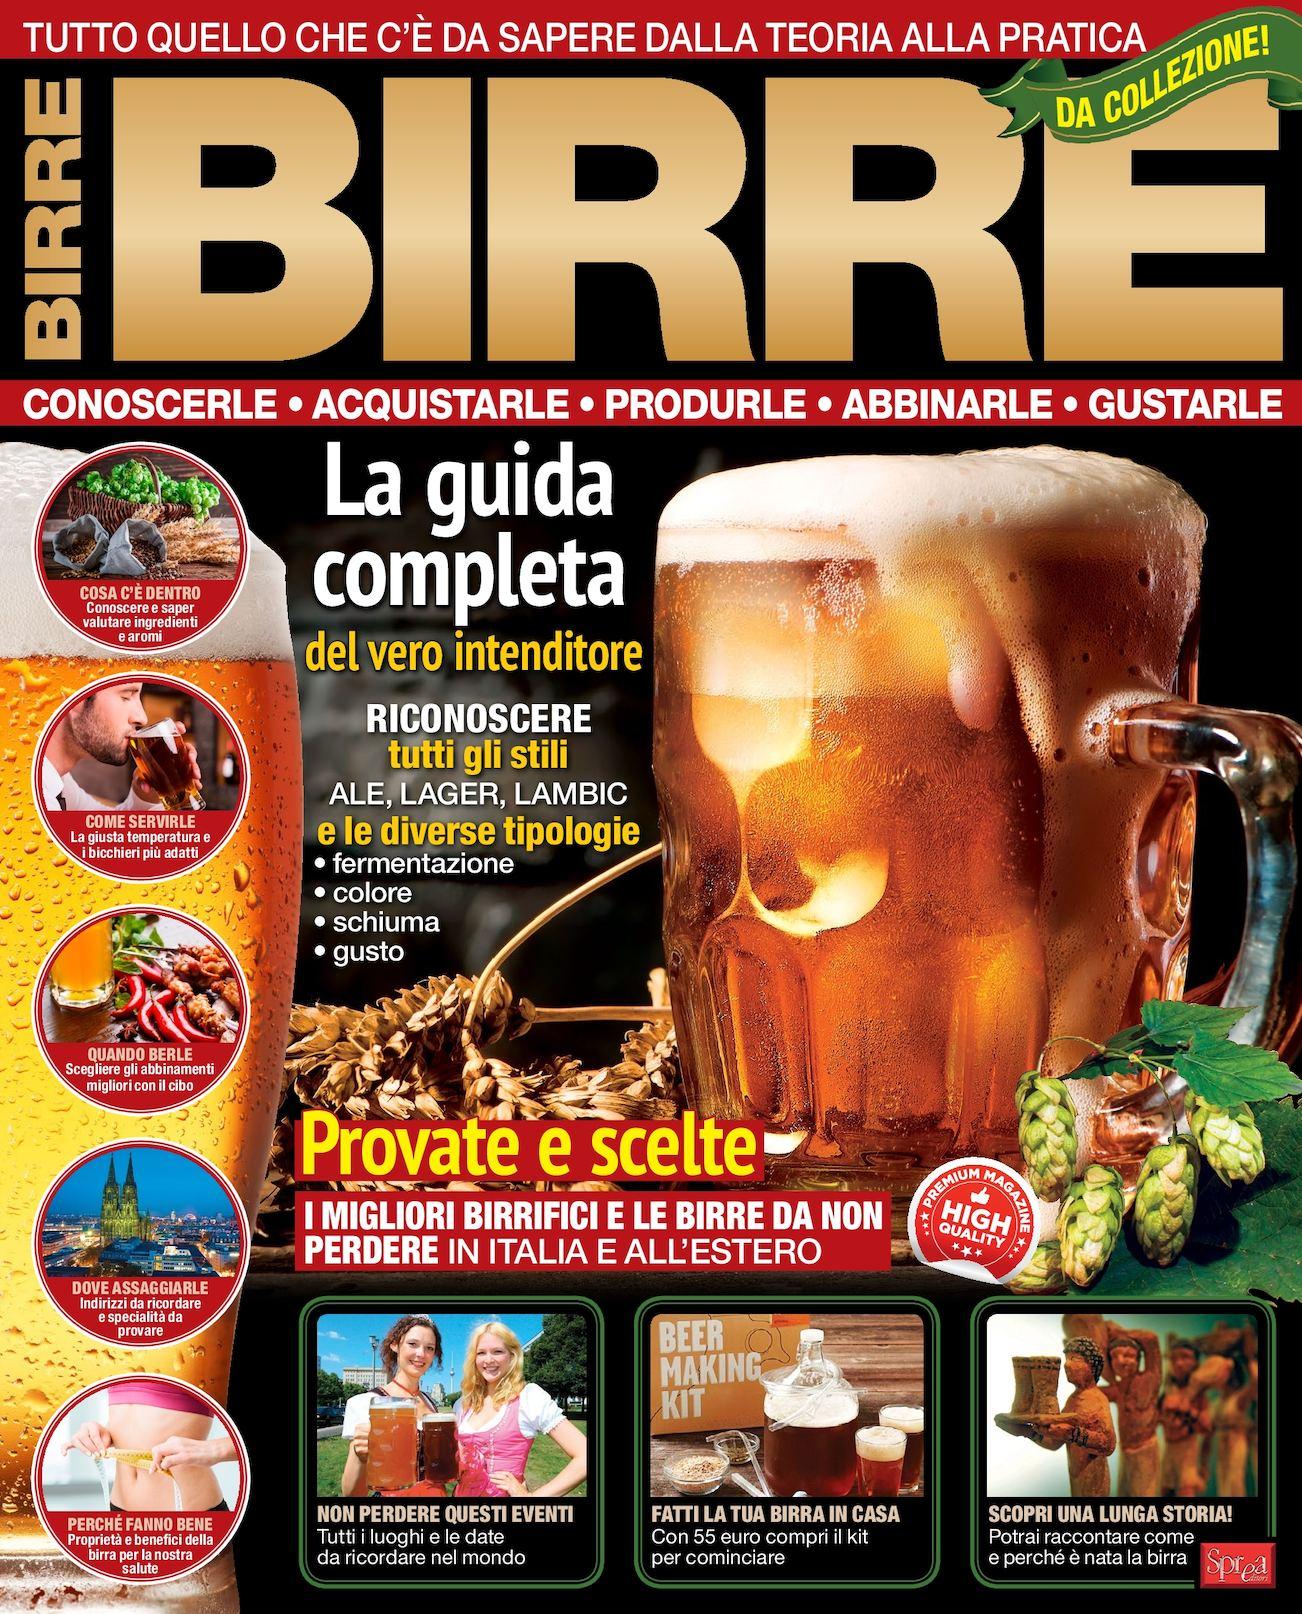 Calaméo - Speciale Birra I Pad 059671d1c3a4